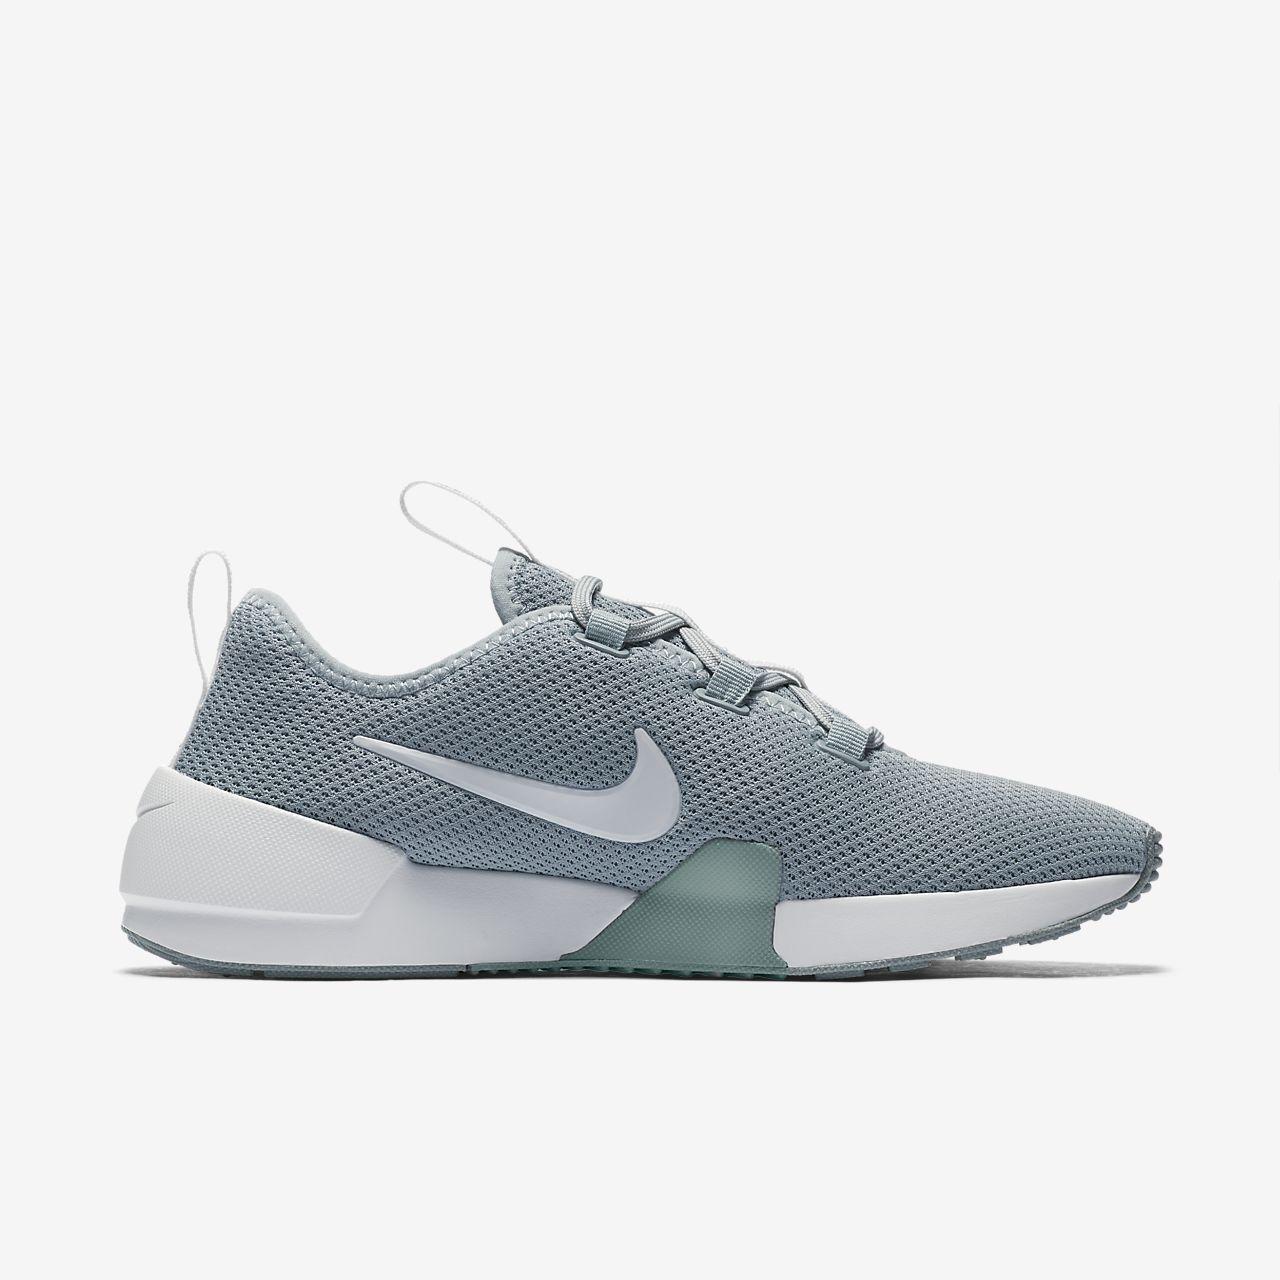 Nike Ashin Women's - - Womens Cheap Online Store 1tOAU0Kw